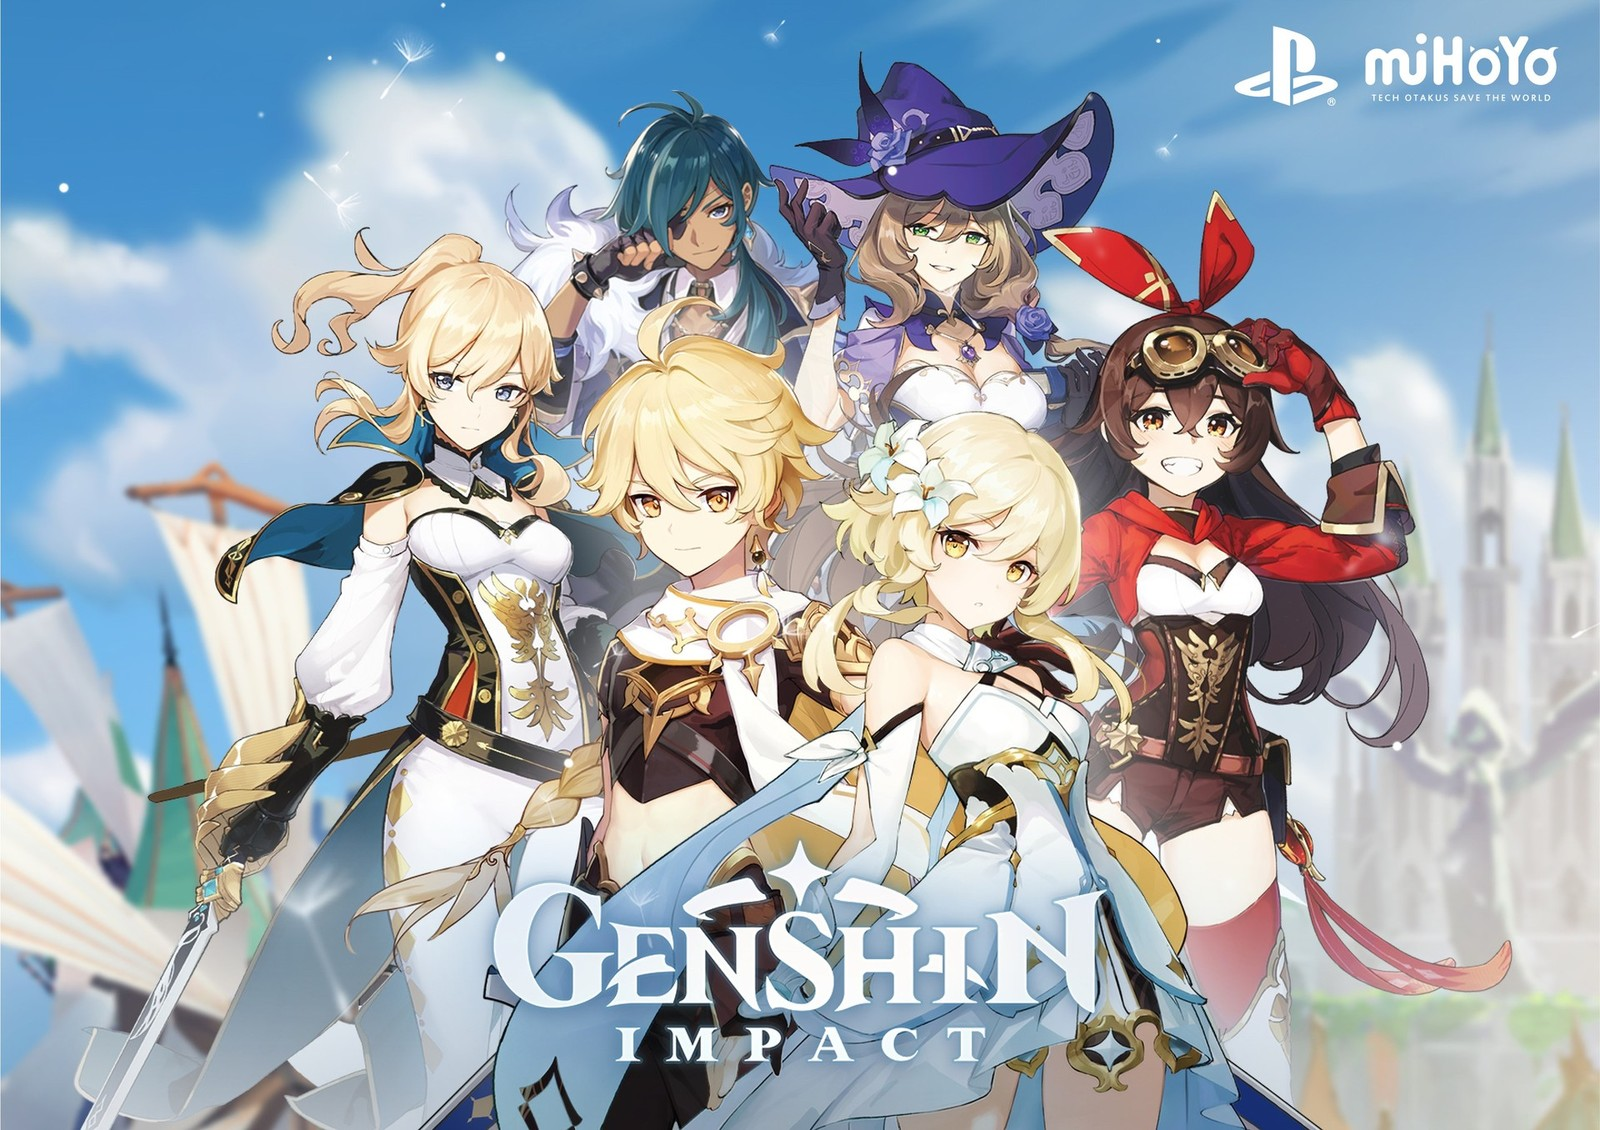 Genshin Impact Daily Check-In